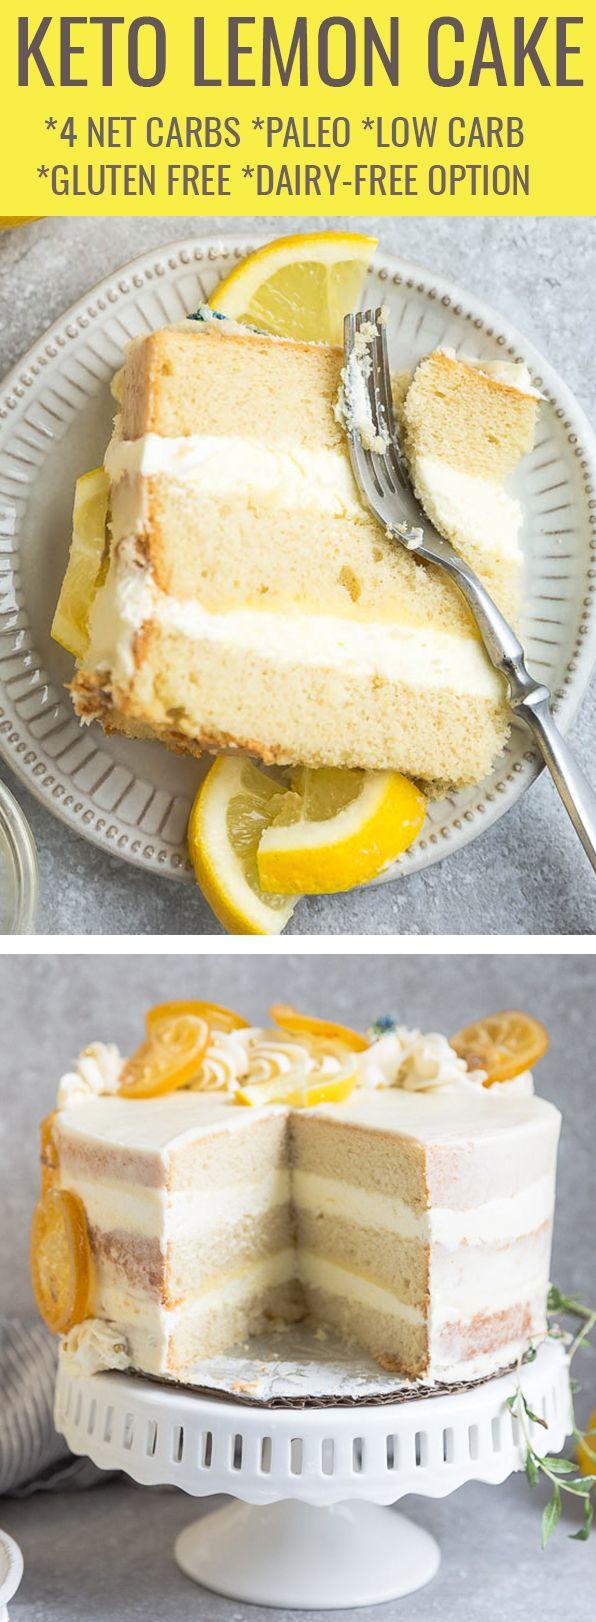 Keto Lemon Cake -   12 desserts For Parties cake ideas